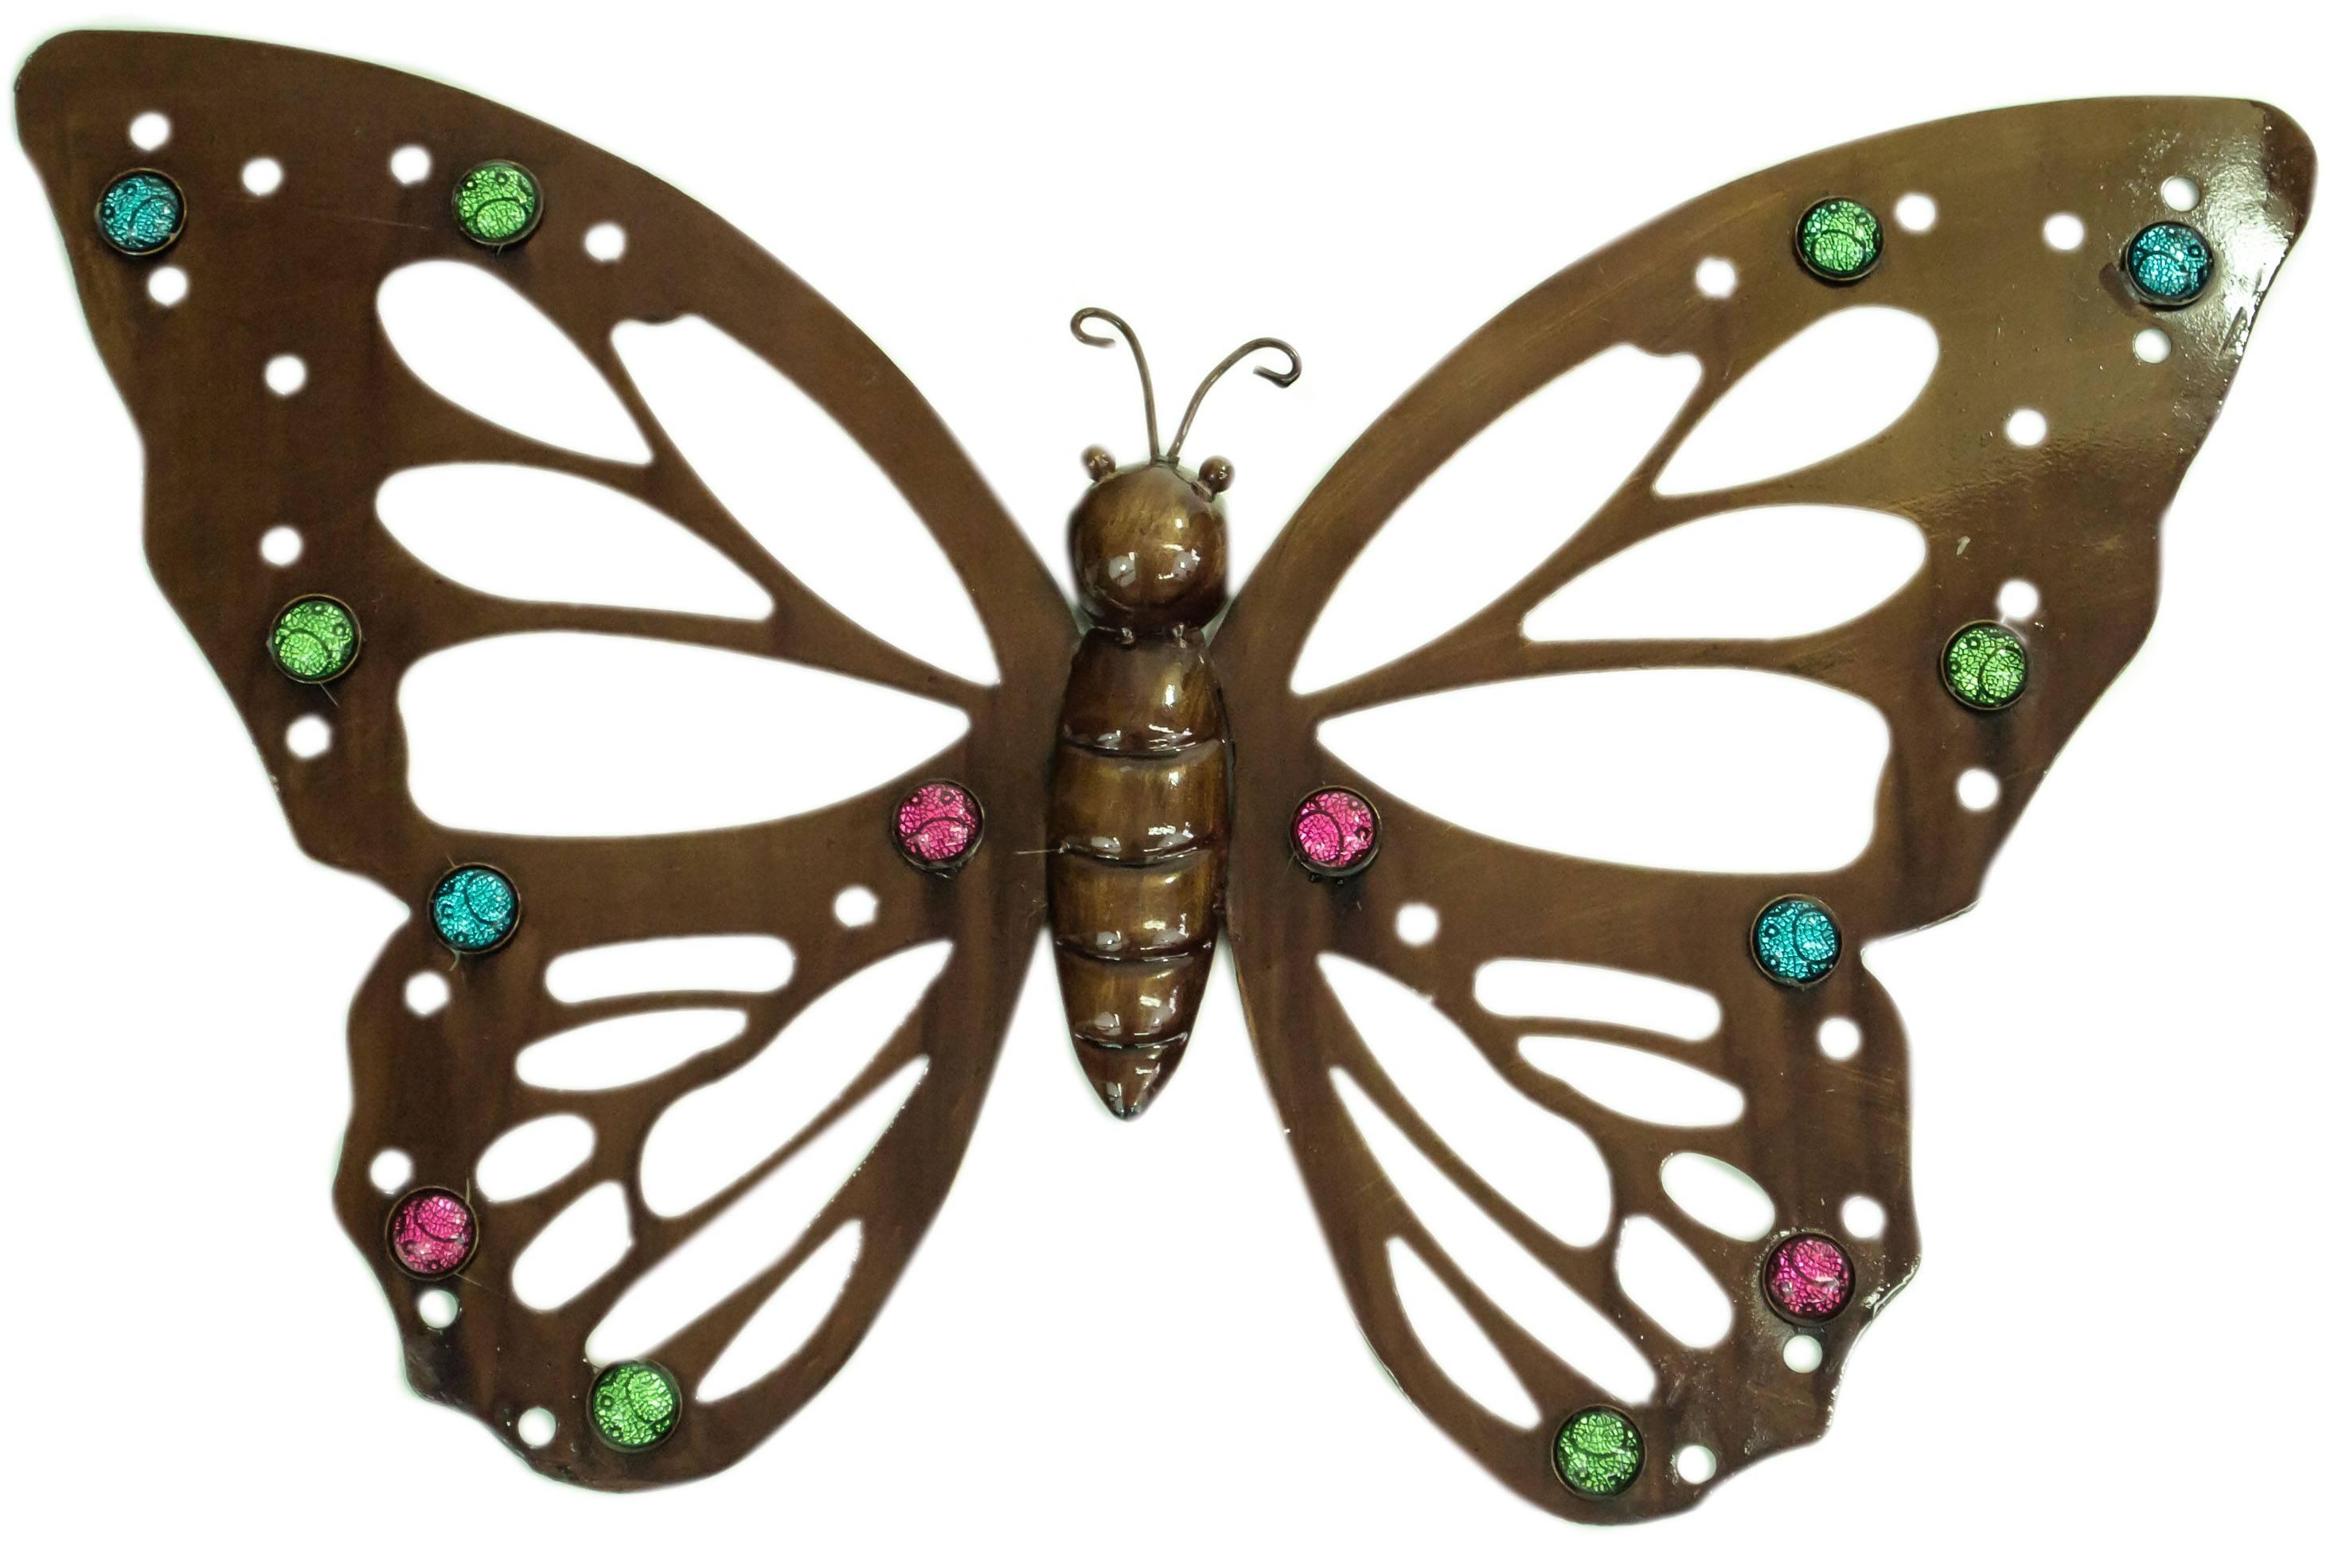 Cream Metal Butterfly Wall Art | Wallartideas Throughout 2018 Large Metal Butterfly Wall Art (View 9 of 25)